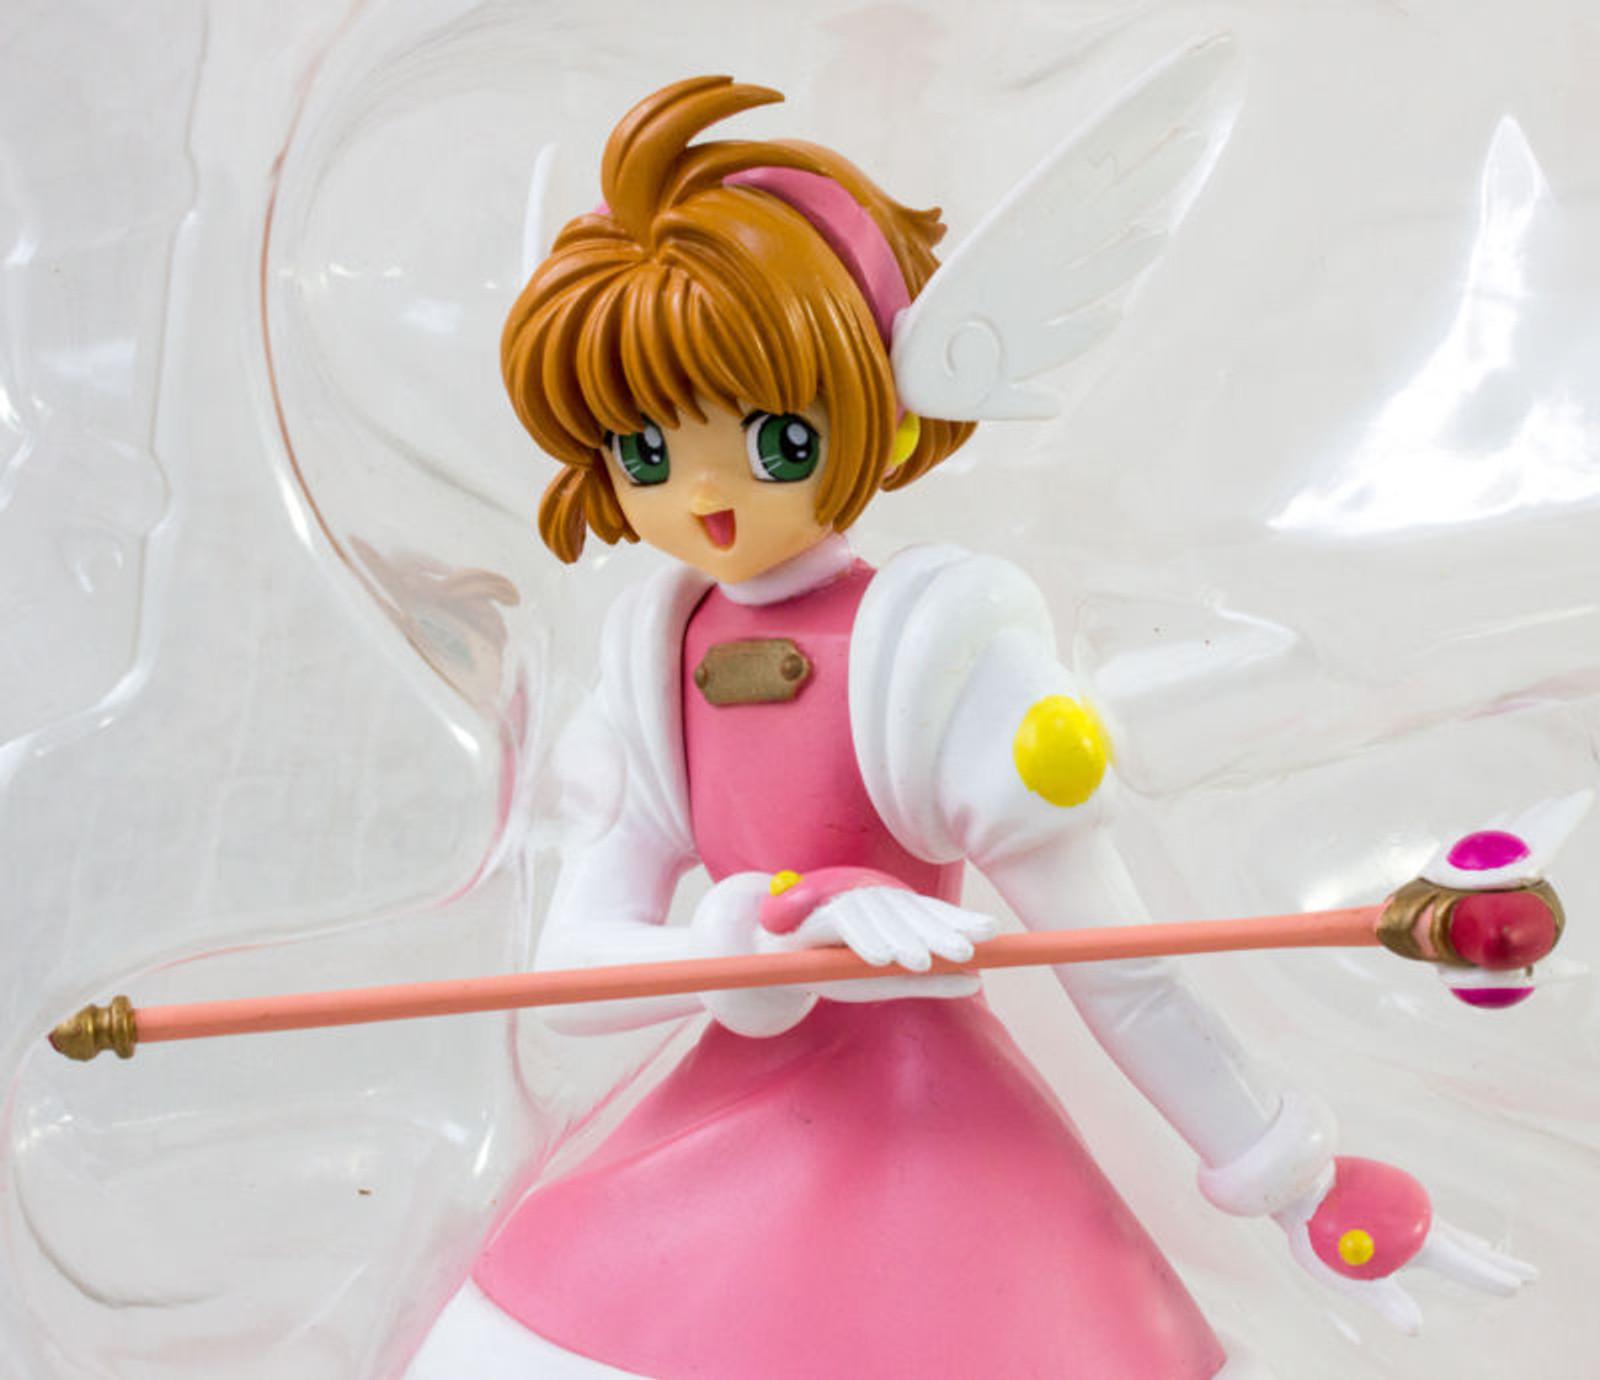 Cardcaptor Sakura Extra Figure Battle Costume CLAMP SEGA JAPAN ANIME MANGA